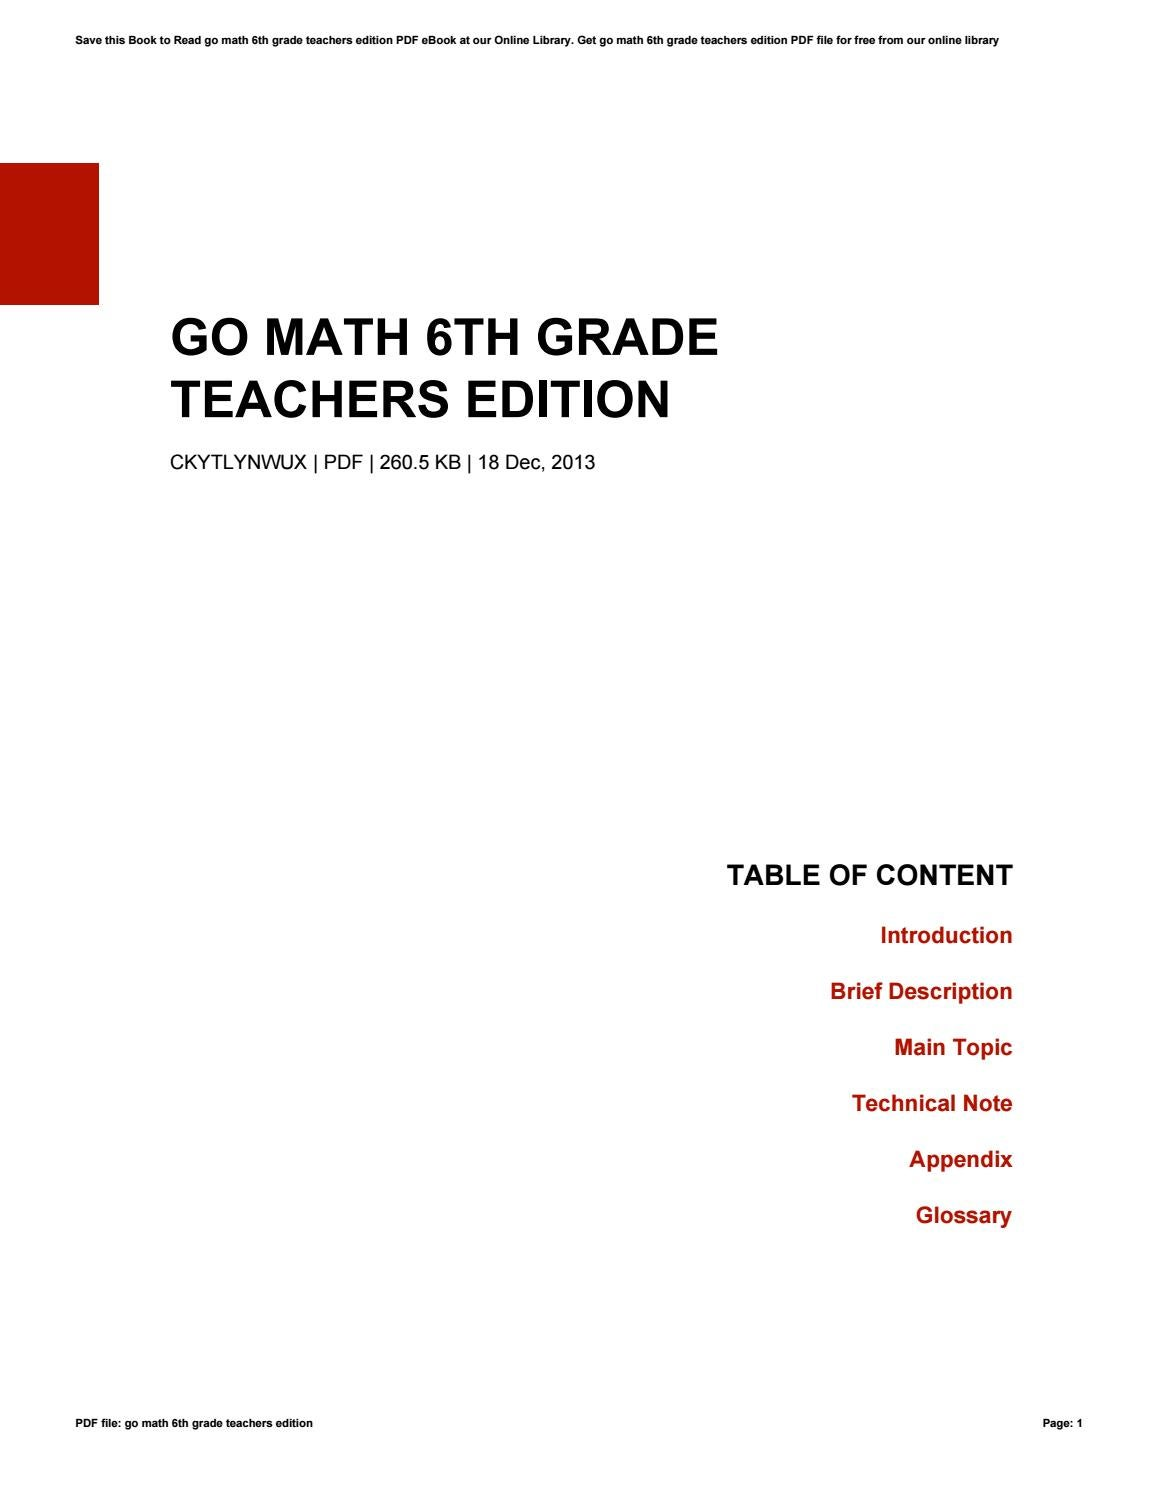 Go math 6th grade teachers edition by JamesBrown21871 - Issuu